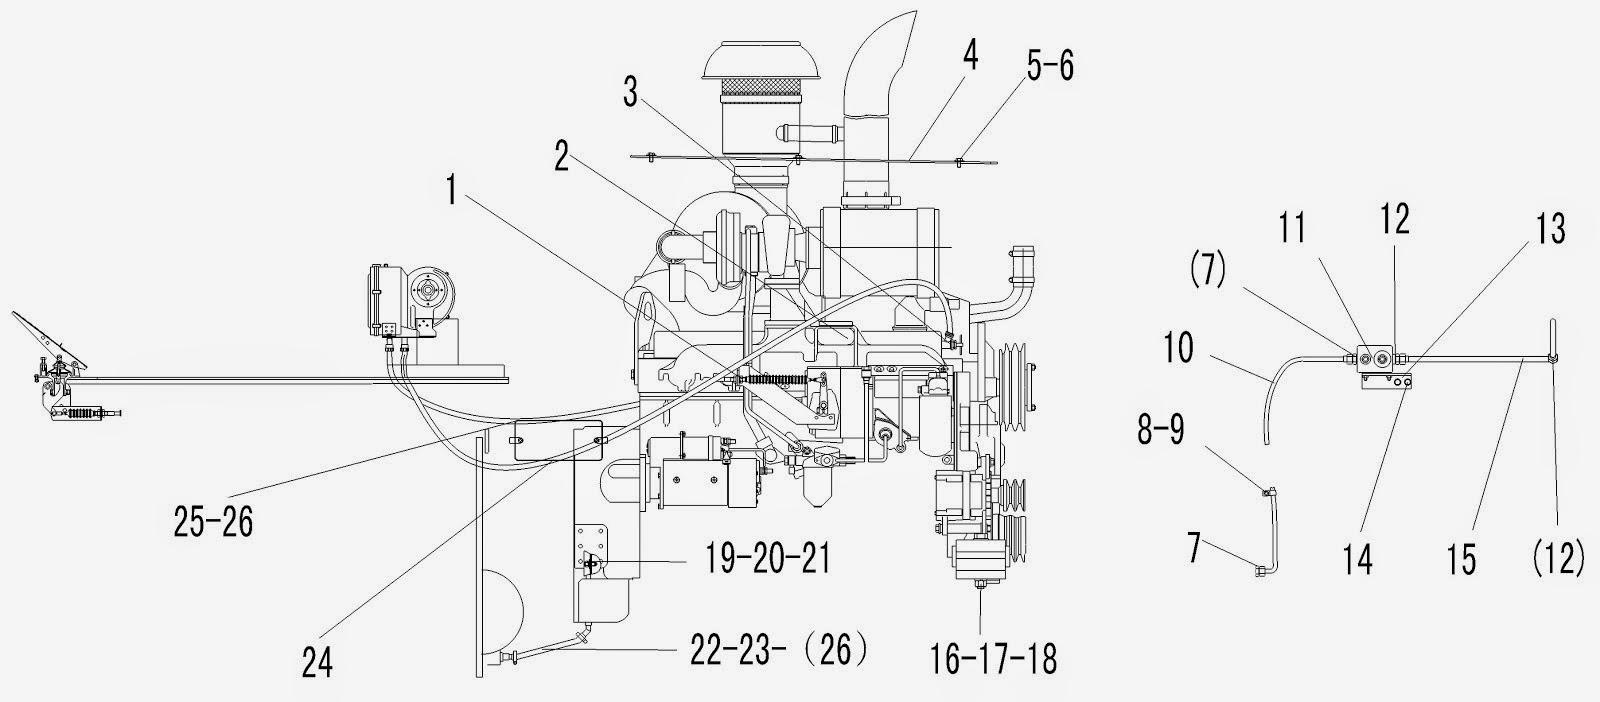 GLOBAL MACHINERY LIMITED: SDLG LG956L WHEEL LOADER DIESEL